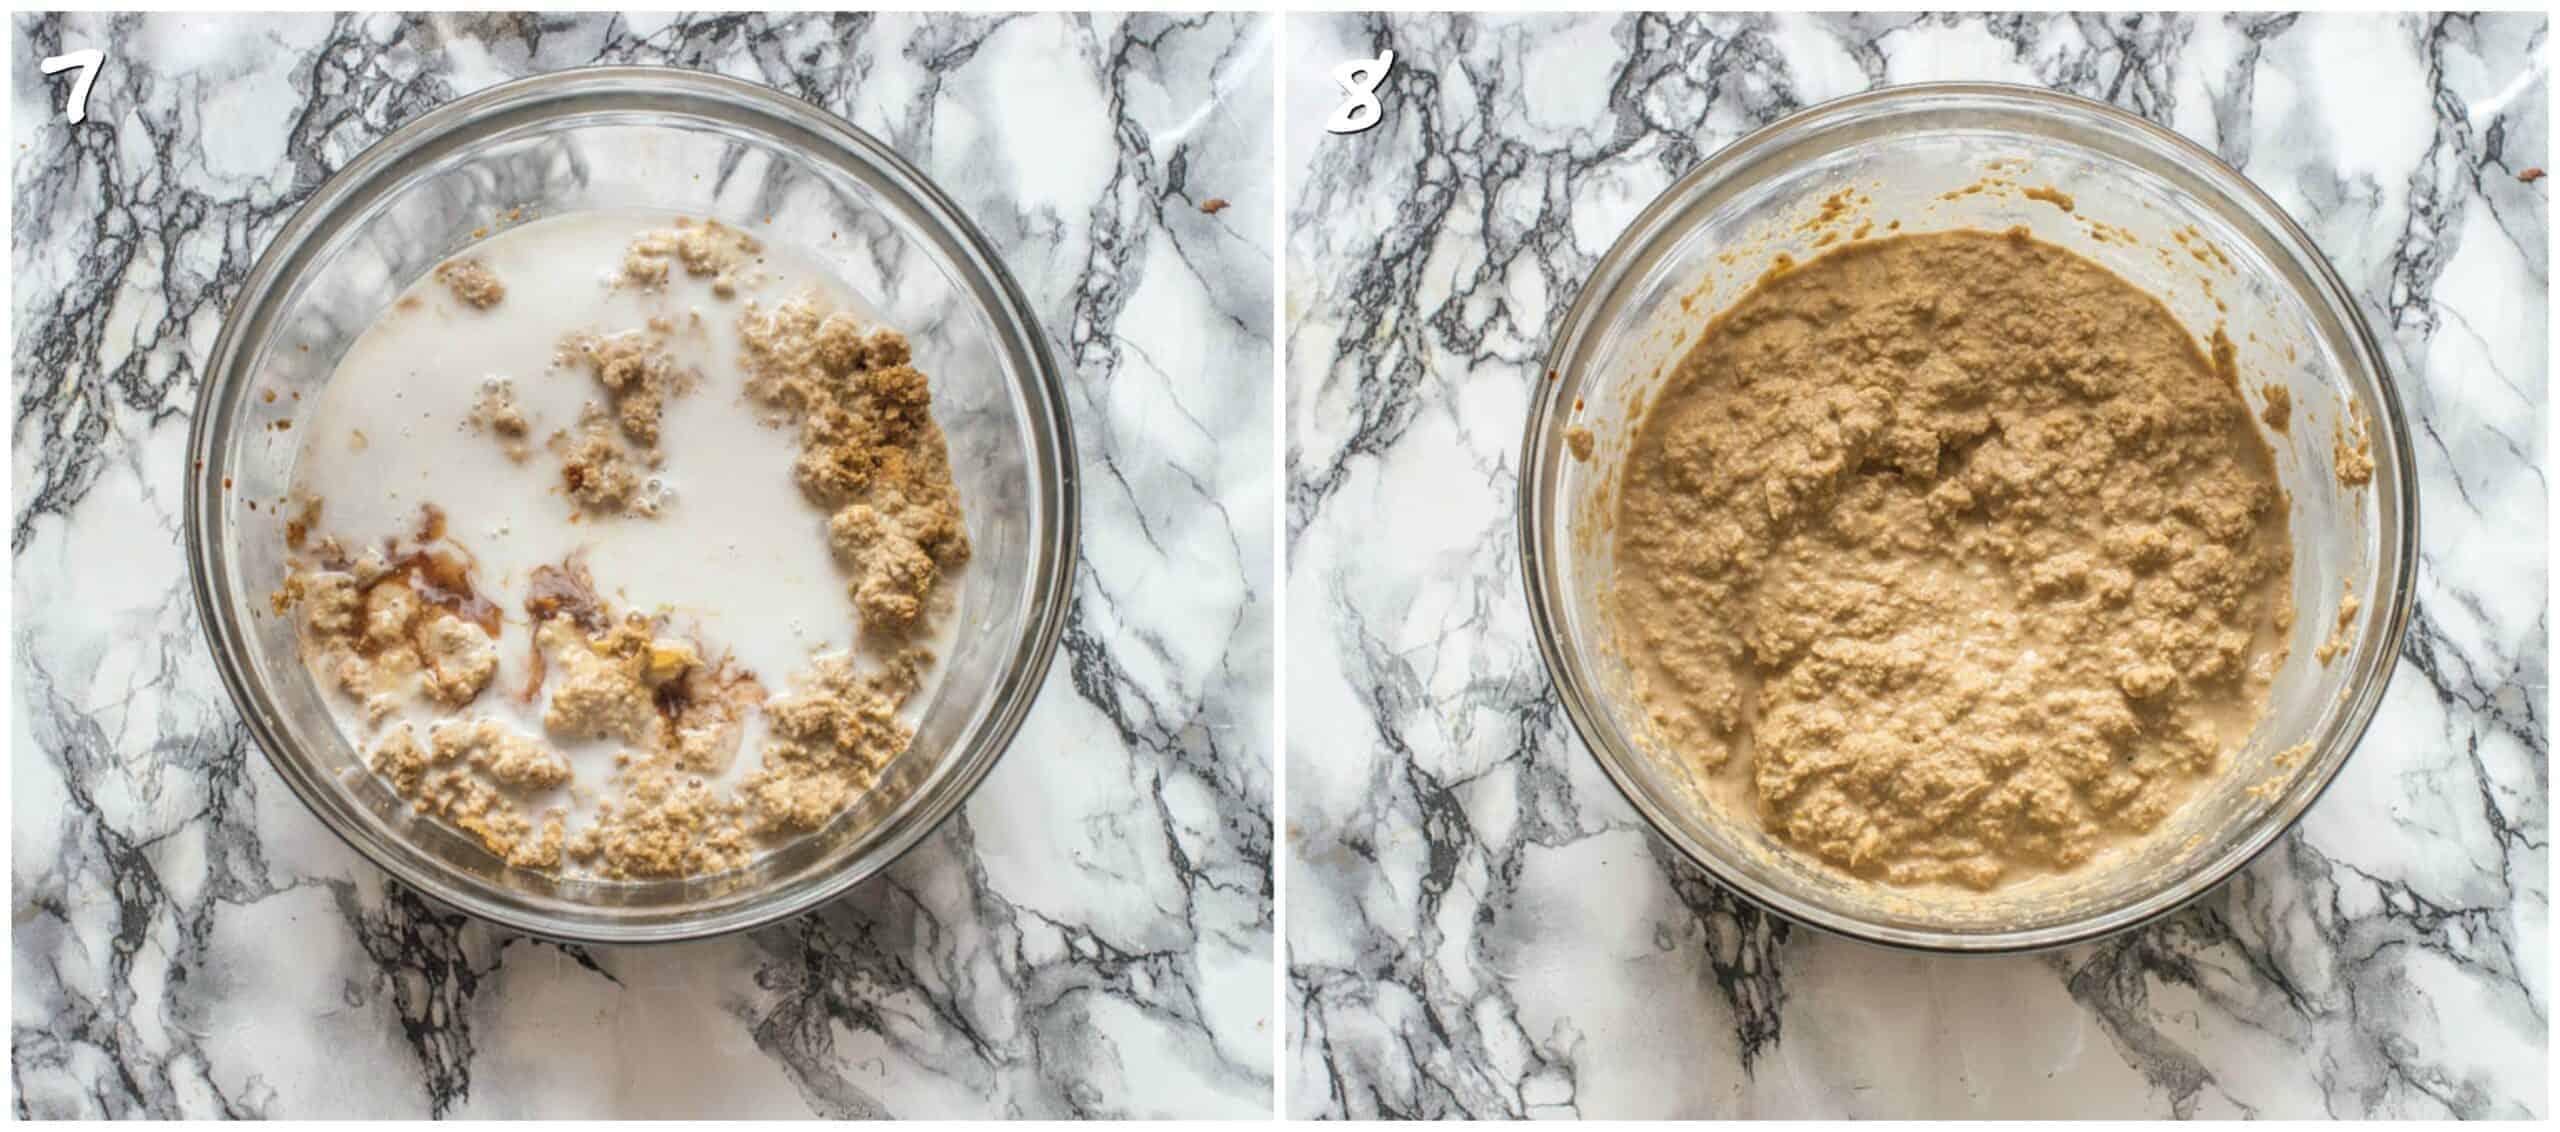 steps 7-8 adding coconut milk to sweet potato puree